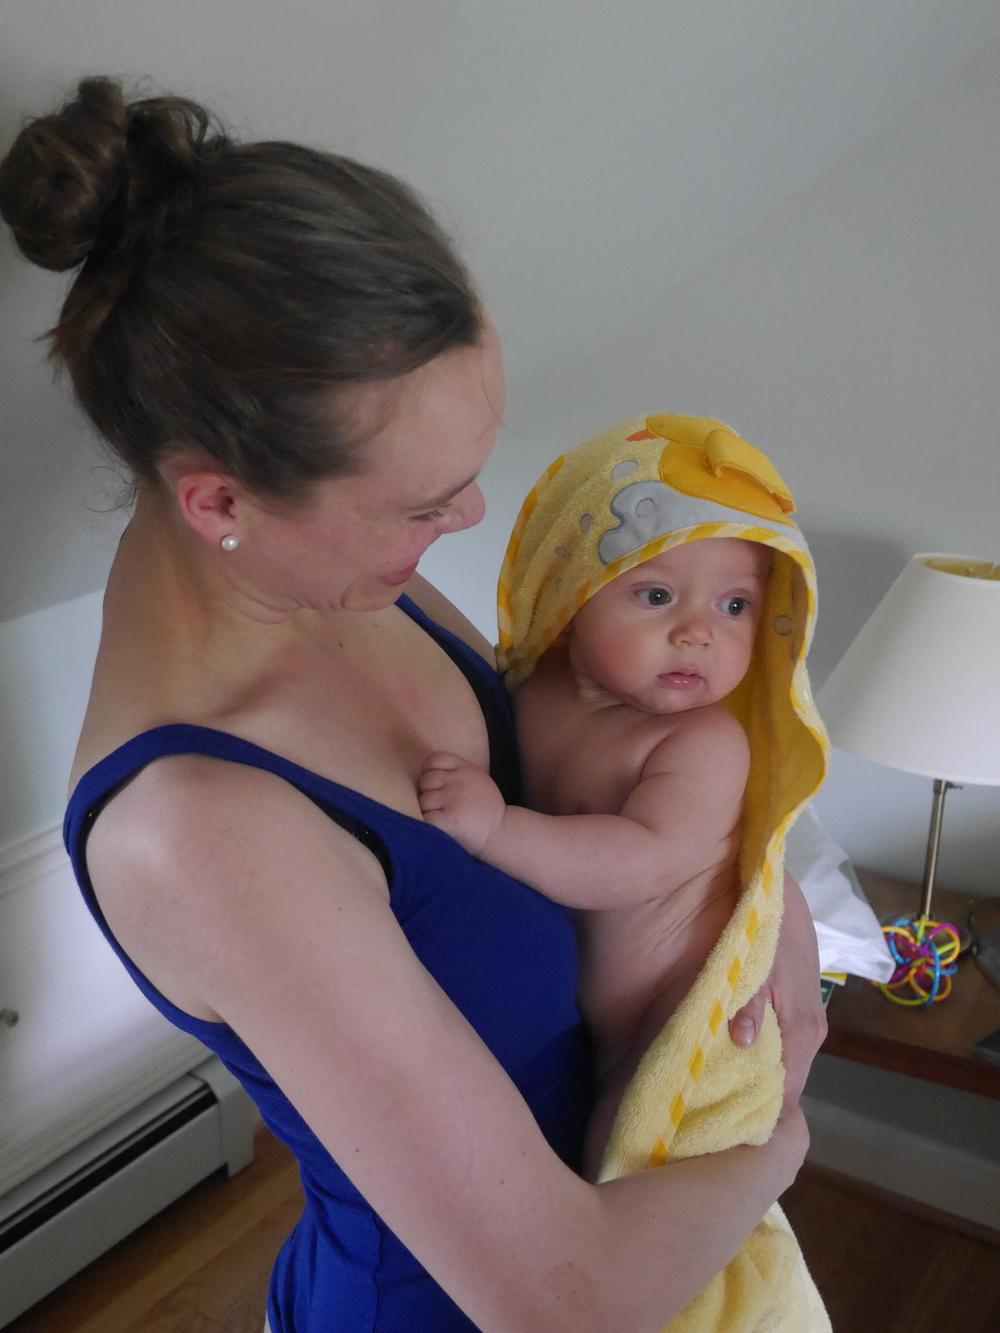 Gabriel in his post-bath pre-shoot dressing gown.